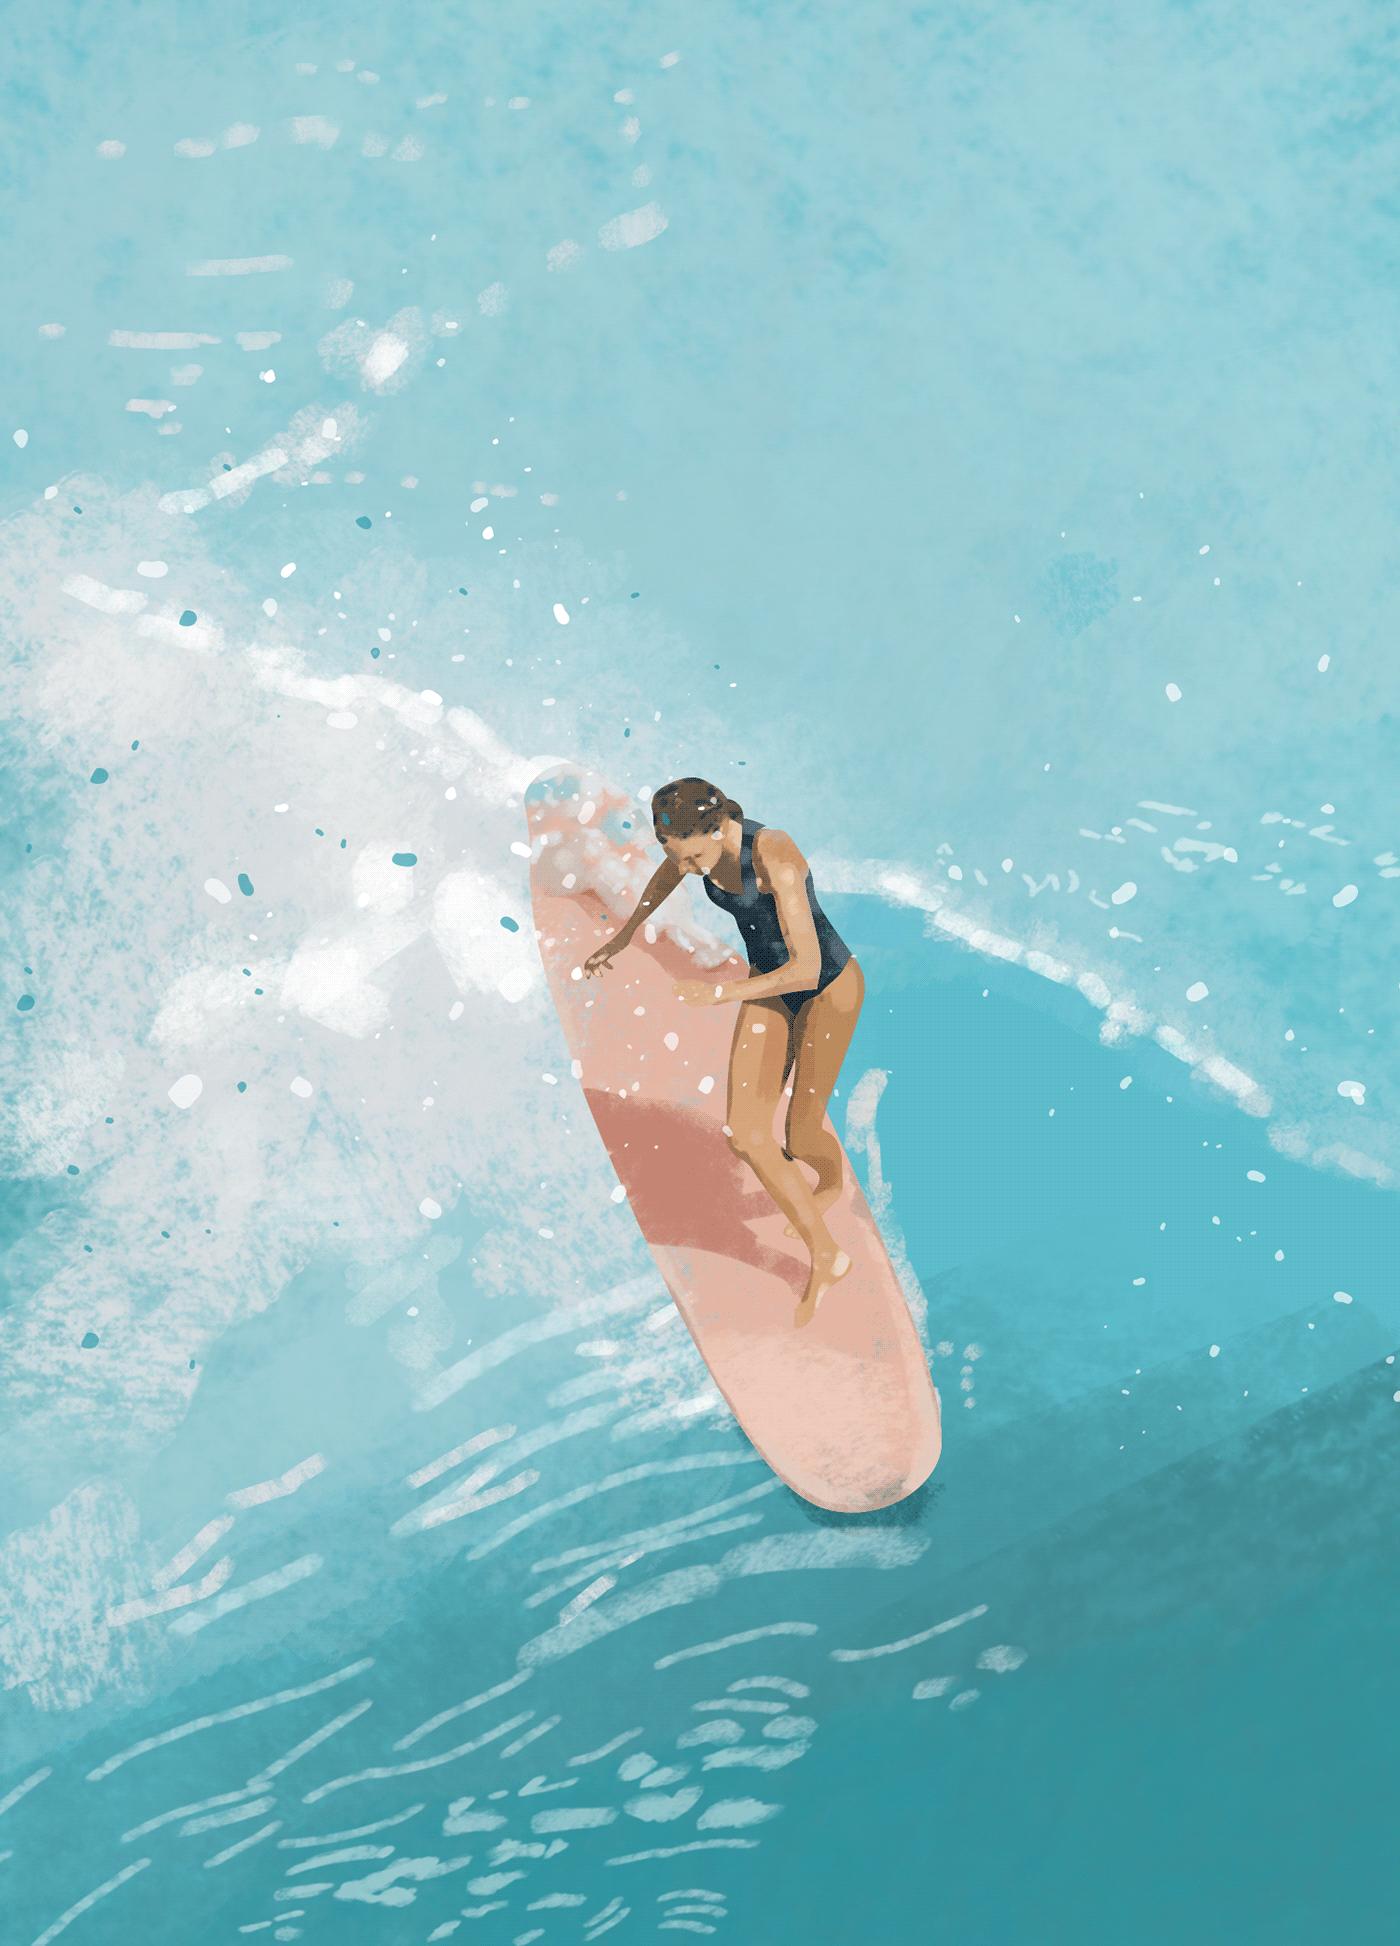 adobe art creative digitalpainting Drawing  hellokaczi ILLUSTRATION  print Surf wacom